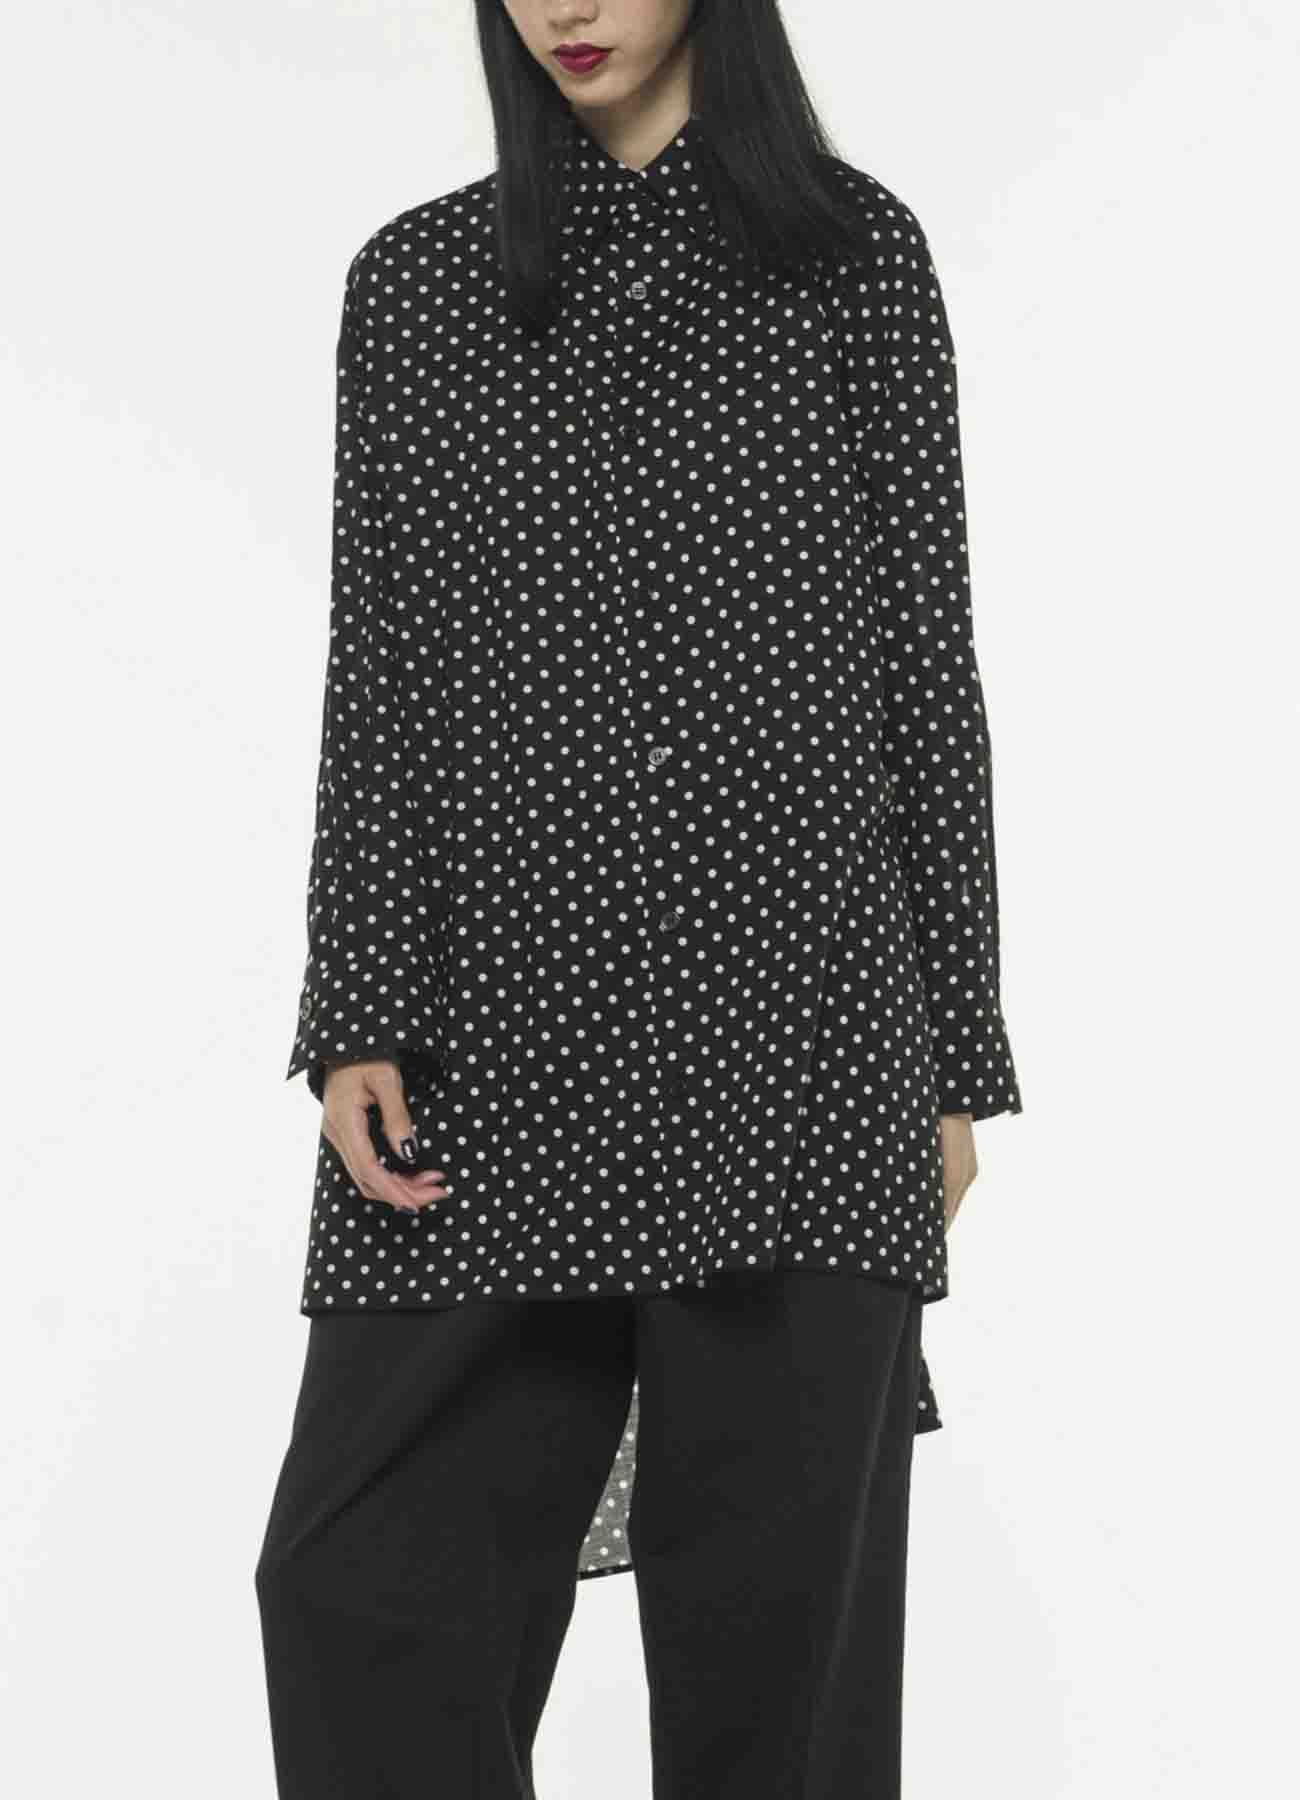 [THE SHOP limited]圆点垂褶罩衫